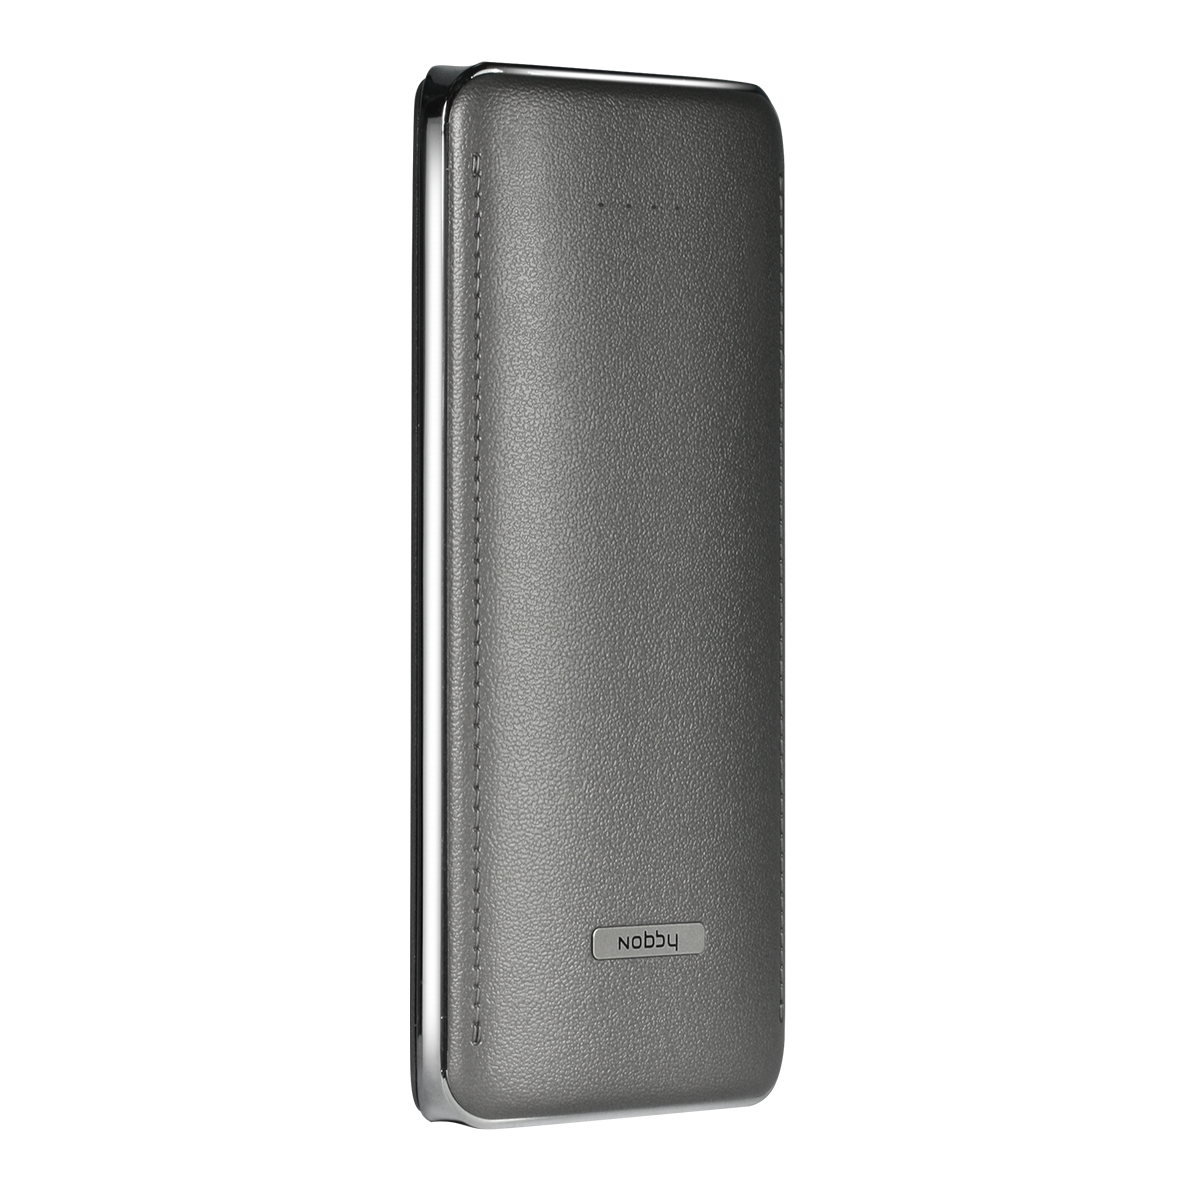 все цены на Nobby Comfort 017-002, Grey внешний аккумулятор (10 800 mAh) онлайн